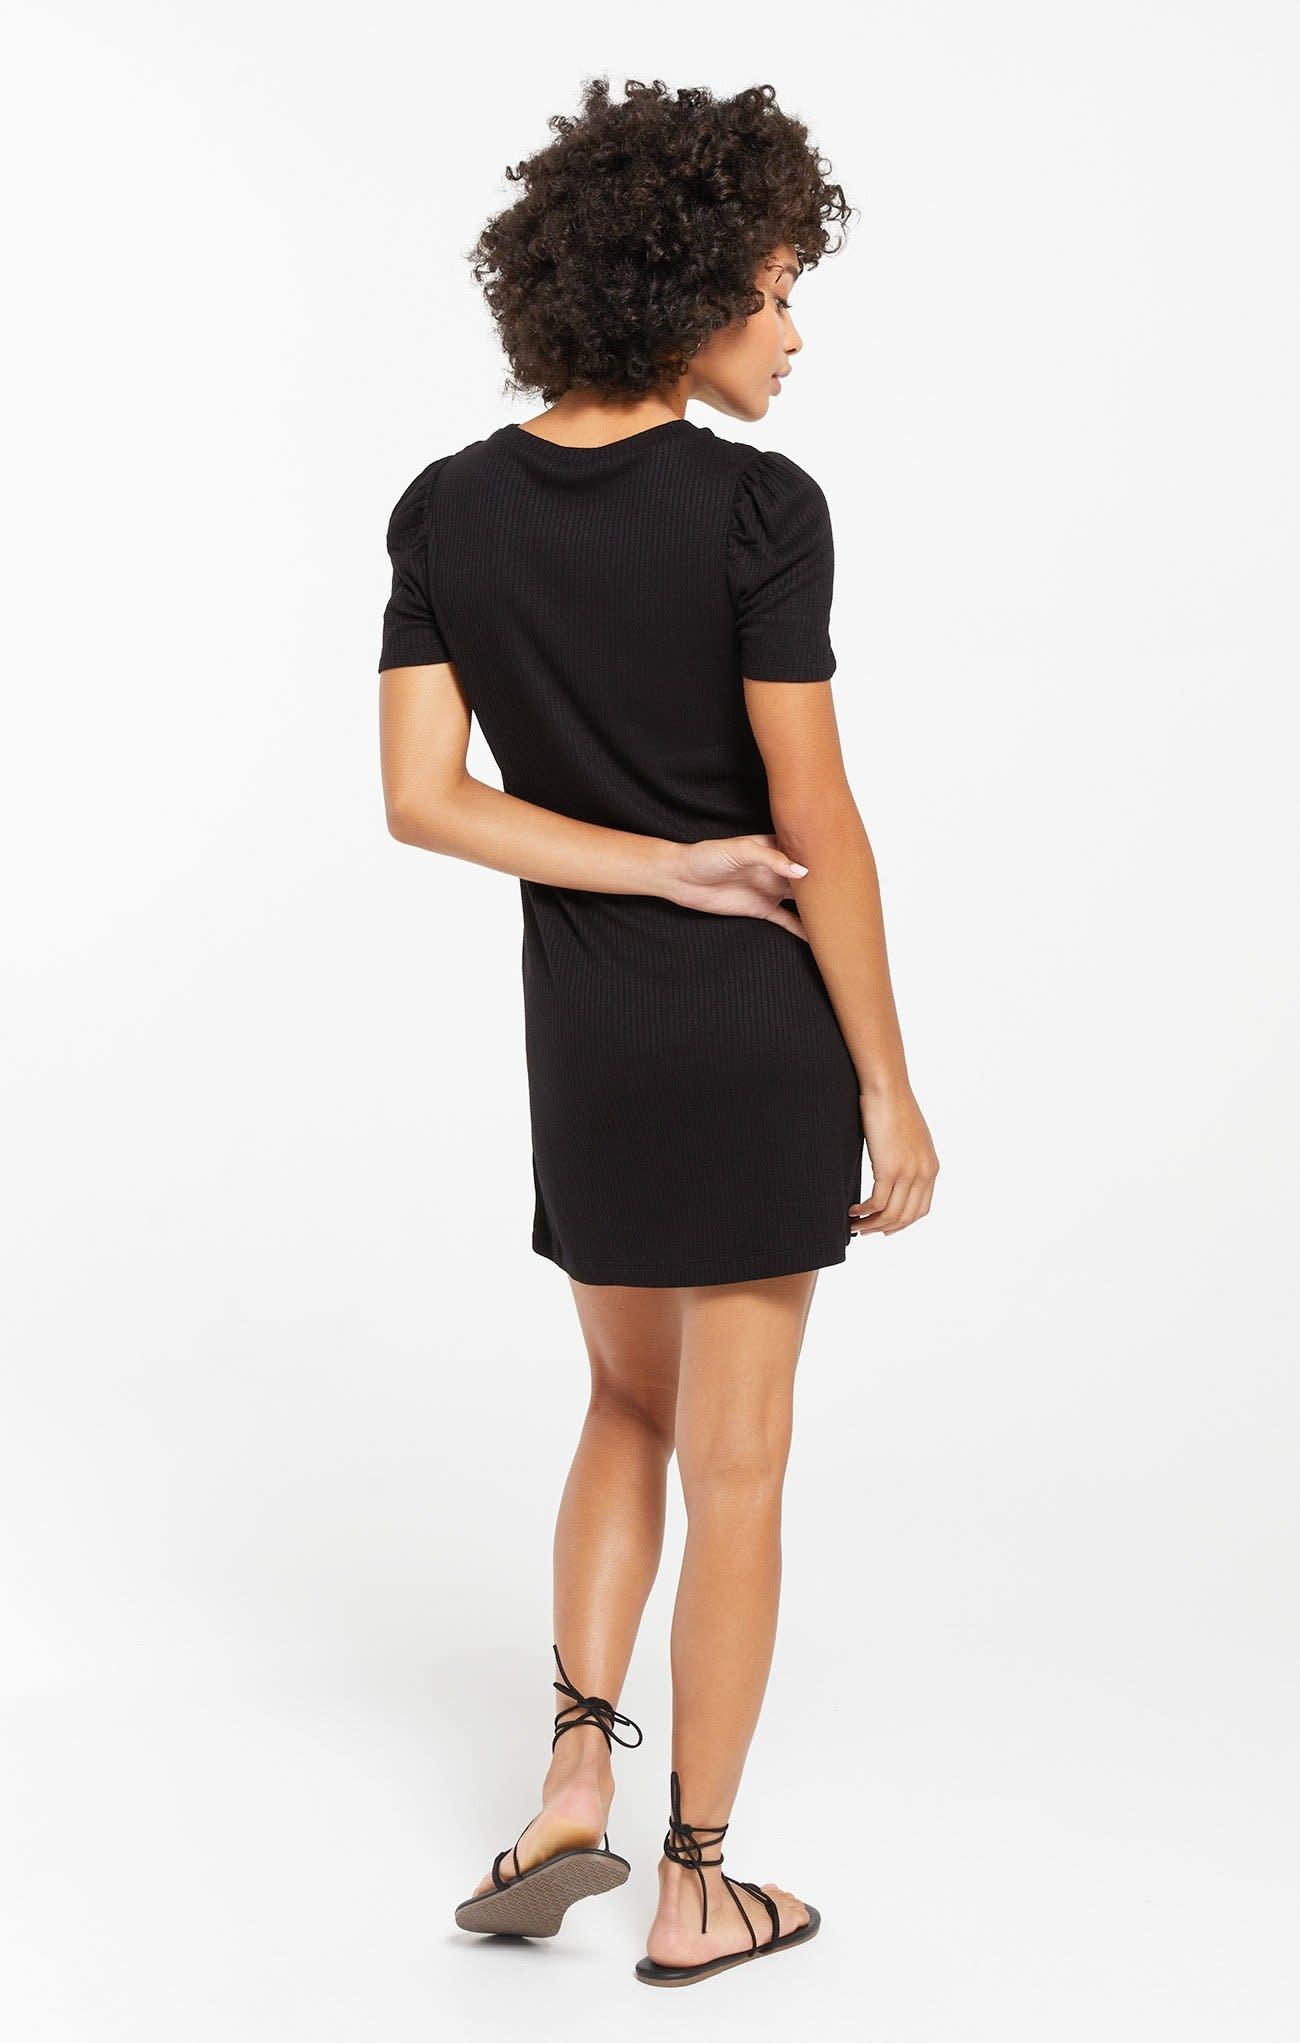 Z Supply Kamryn Puff Sleeve Rib Dress